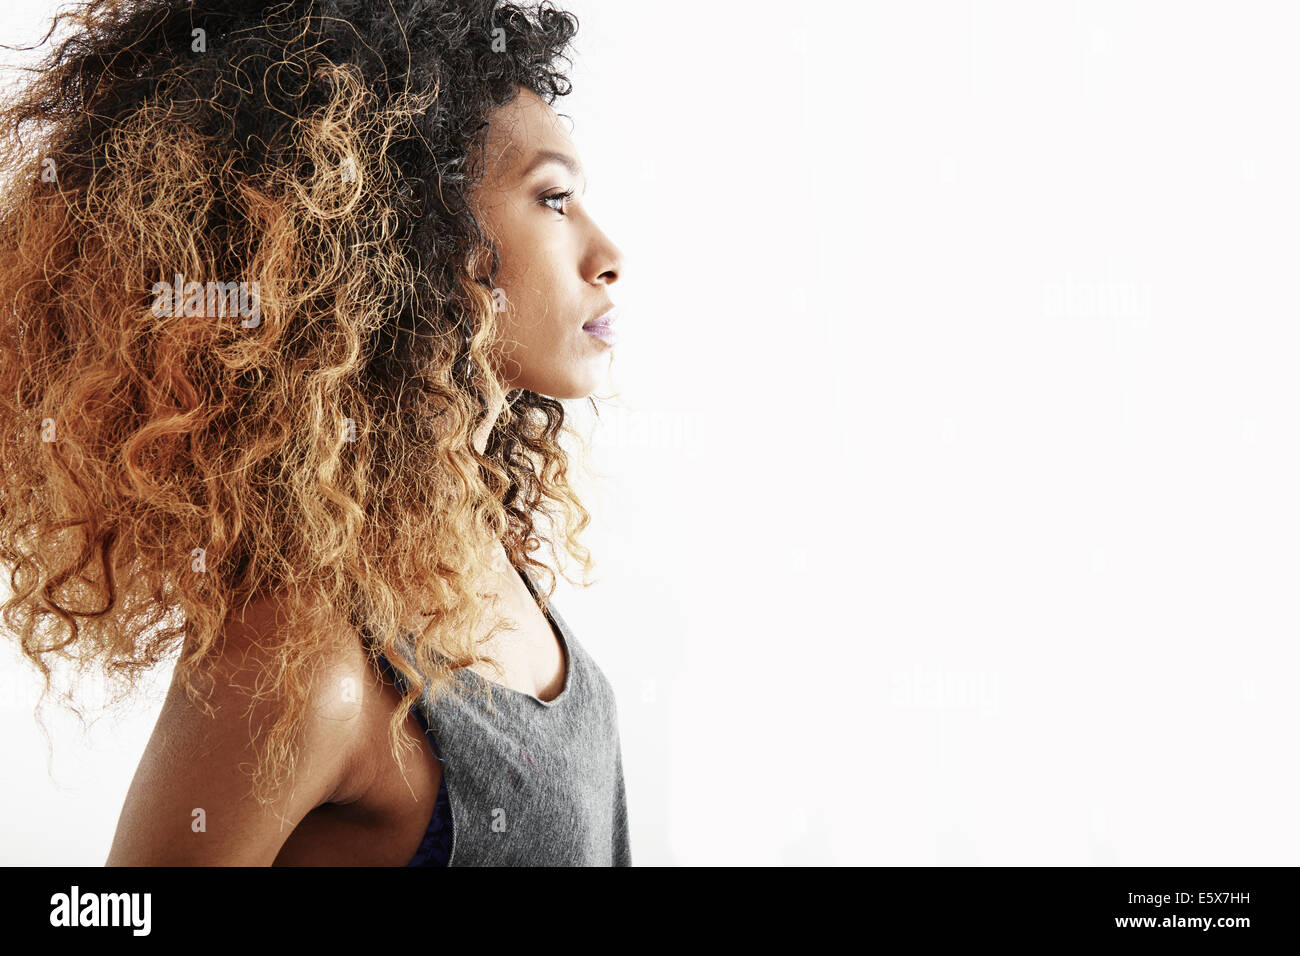 Studio Profile retrato de mujer joven serio Imagen De Stock